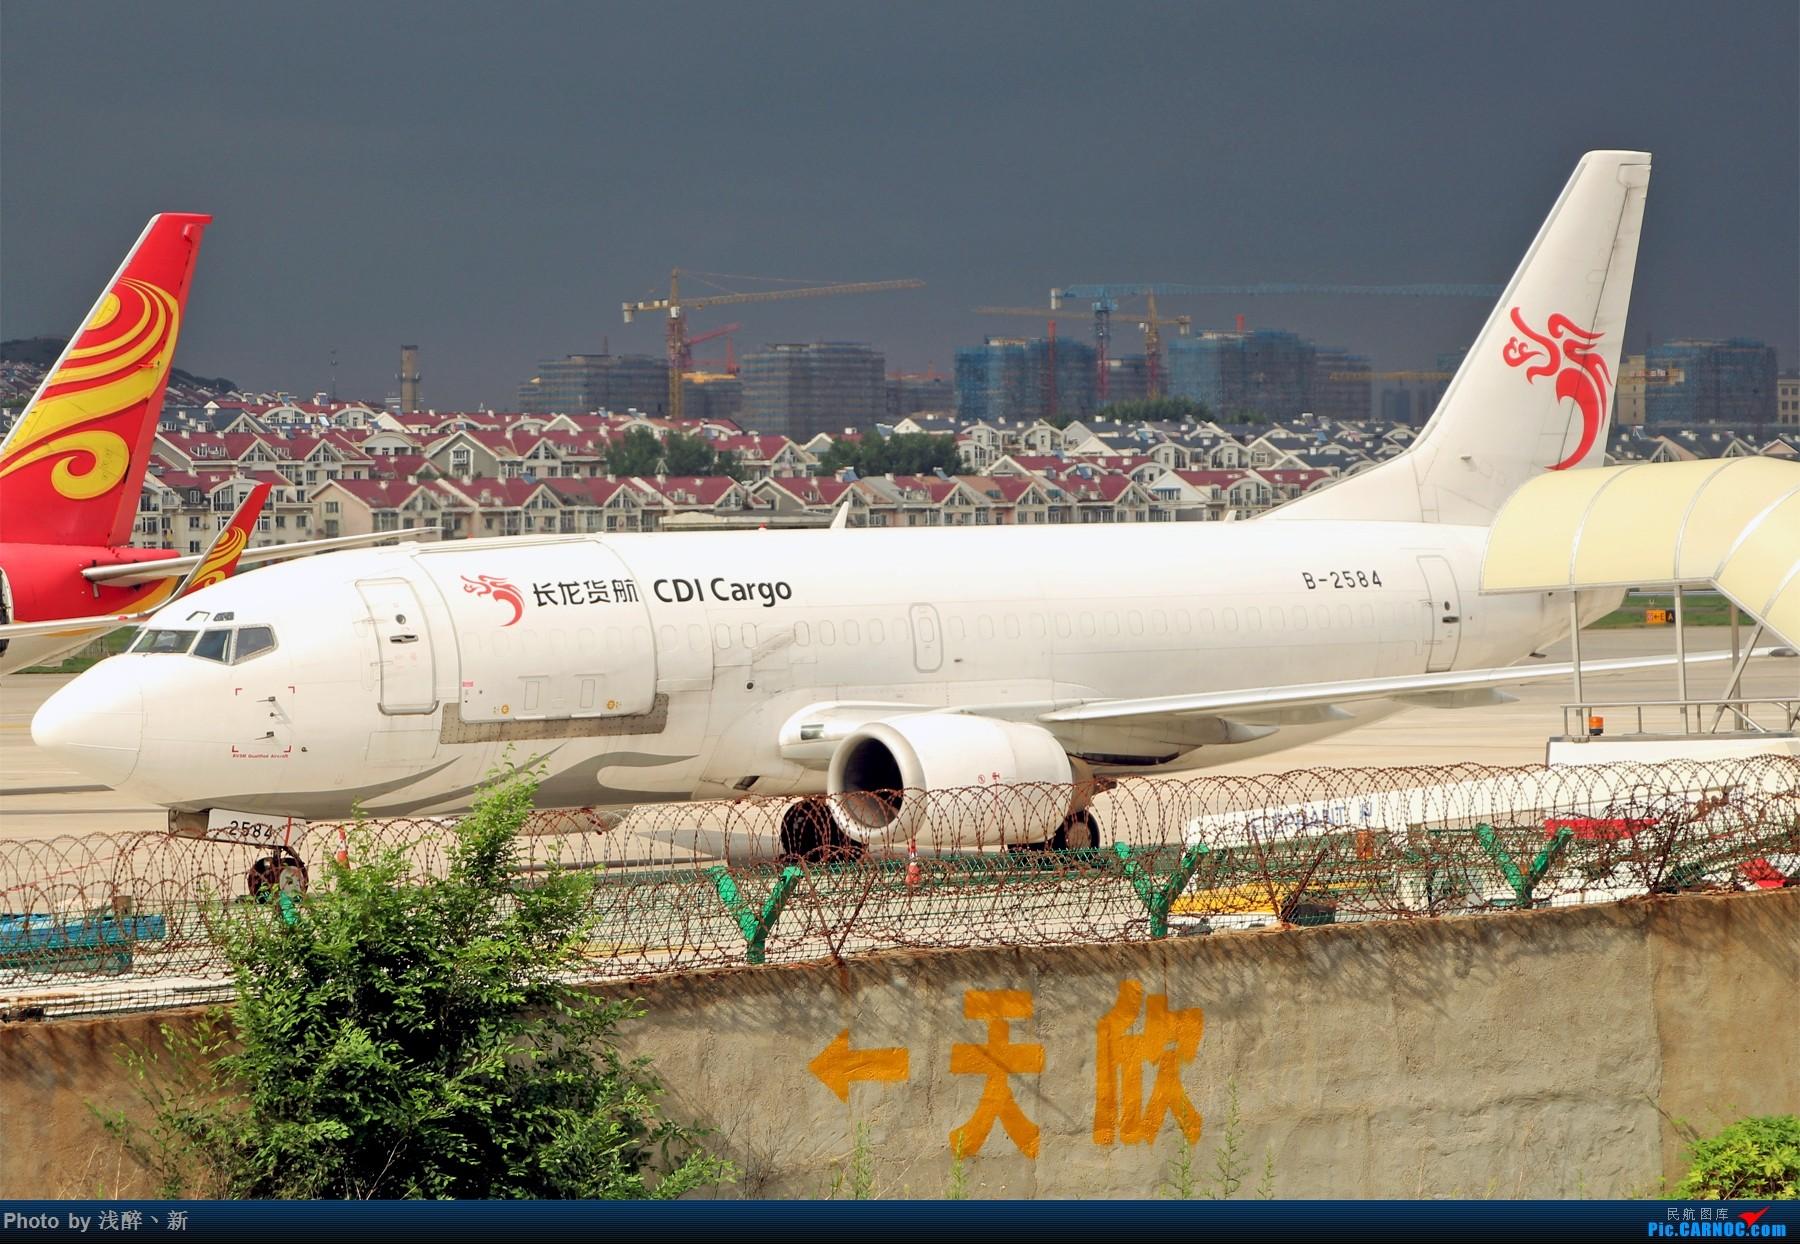 Re:[原创]DLC 7.16 机场游击战 BOEING 737-300 B-2584 中国大连国际机场